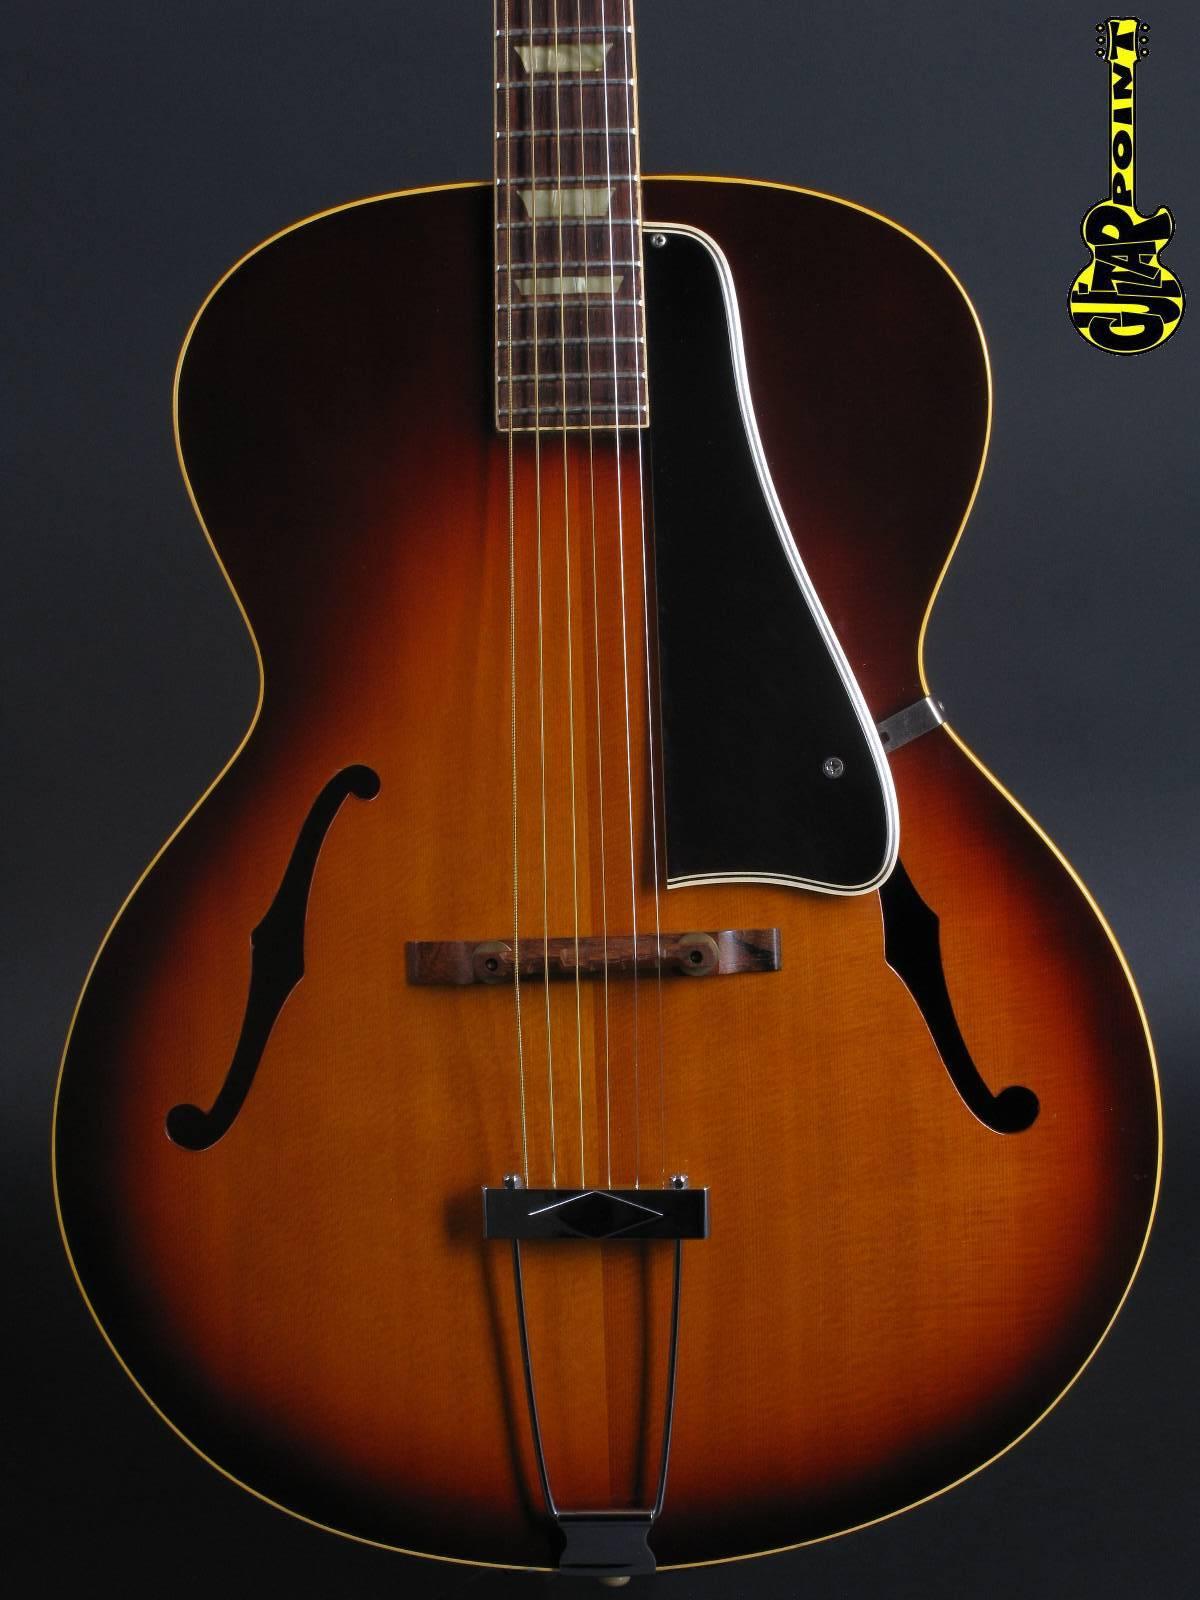 1966 Gibson L-50 - Sunburst